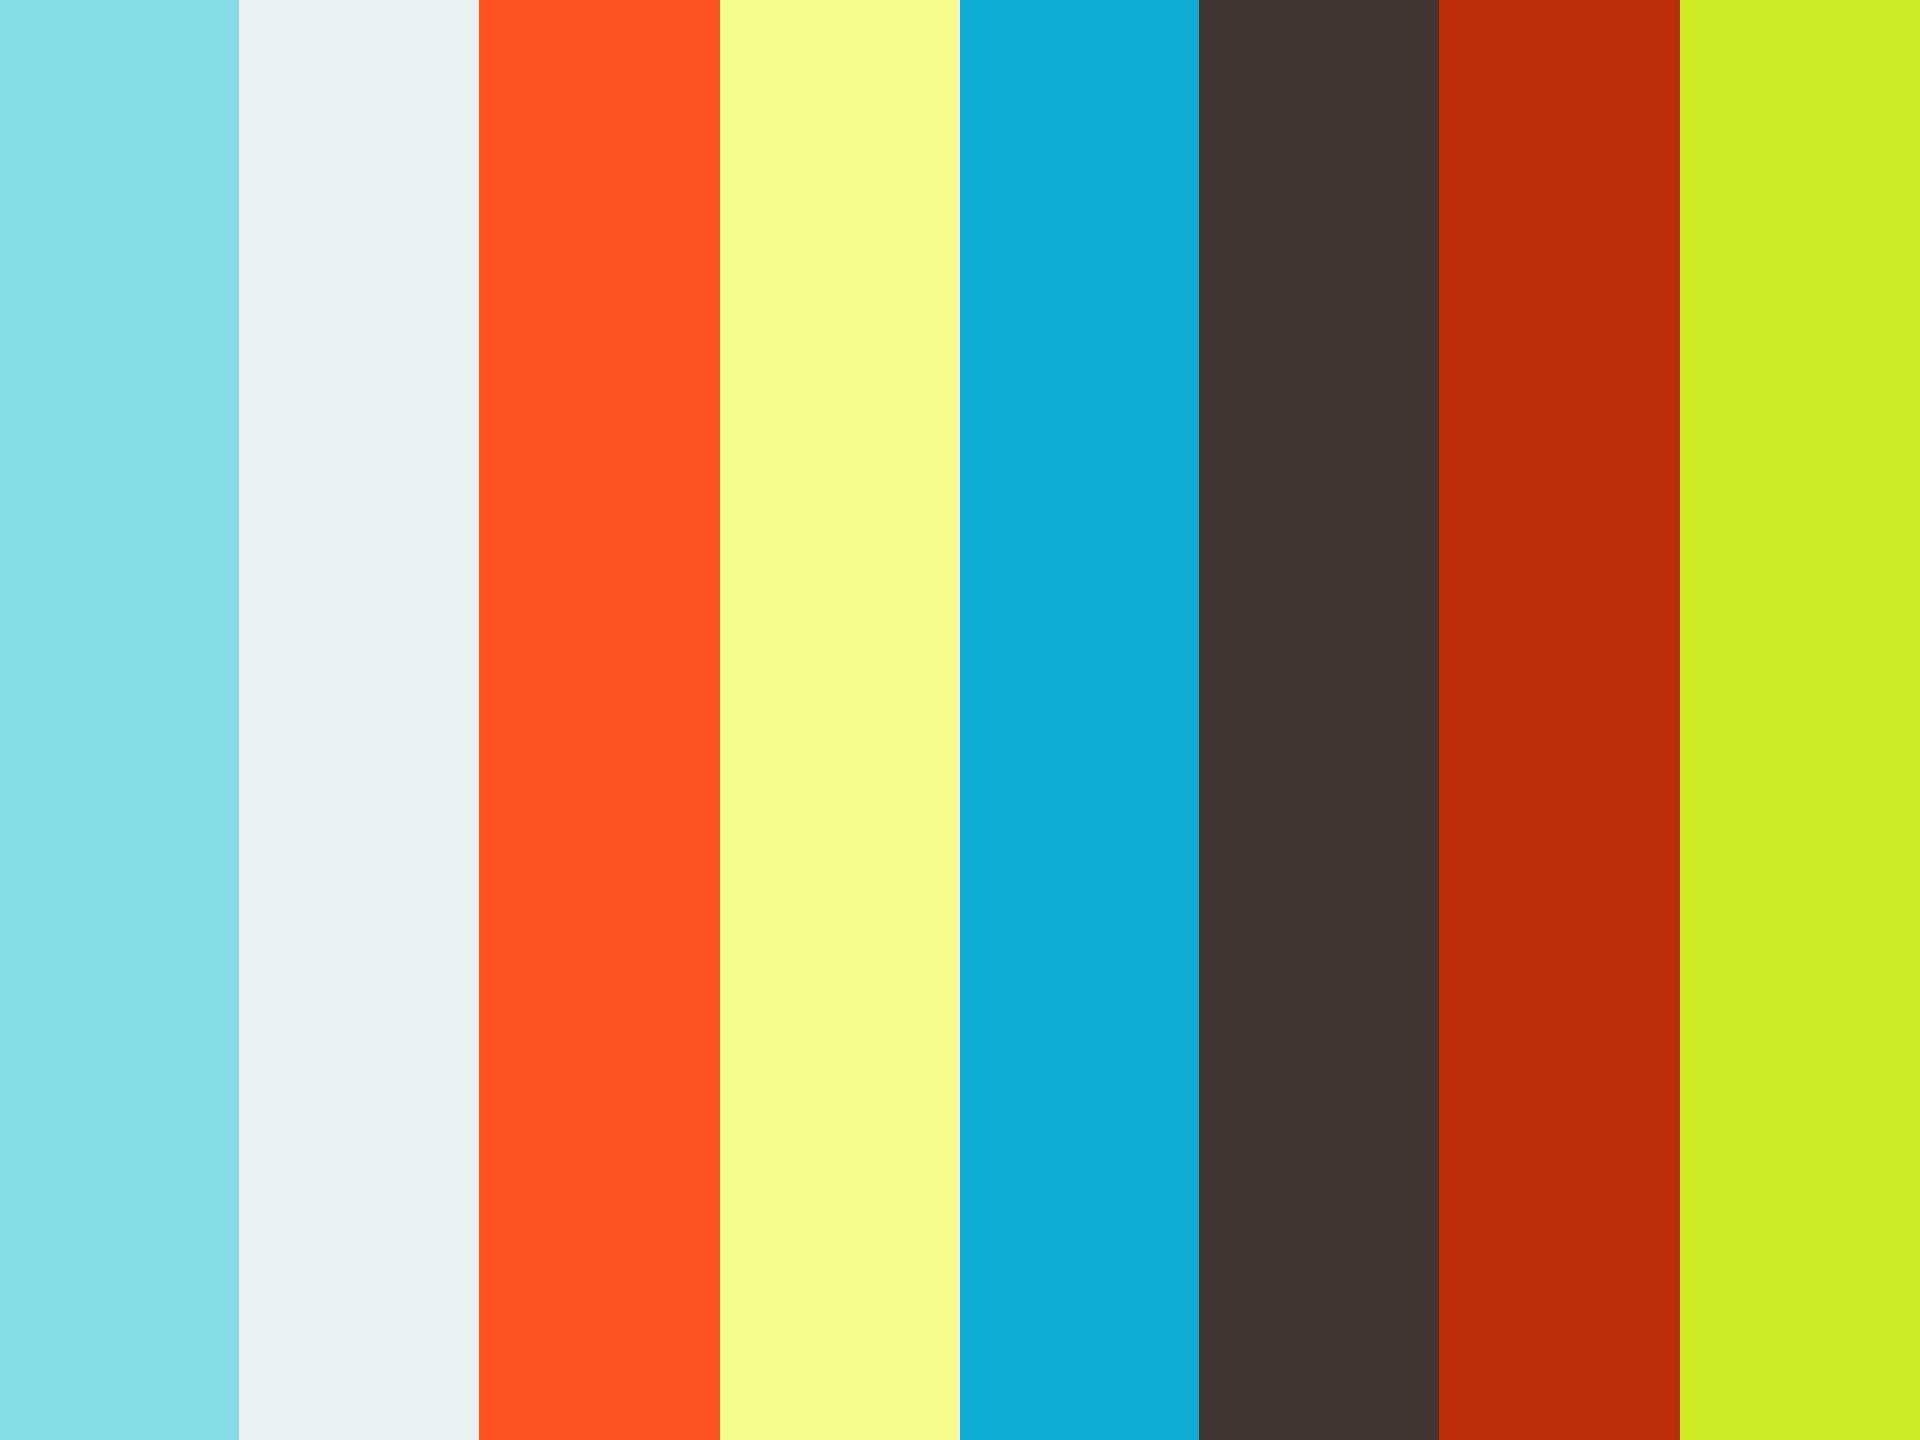 Rencontre Gay Colmar Gay Cul Dilaté / Gay Enculeur